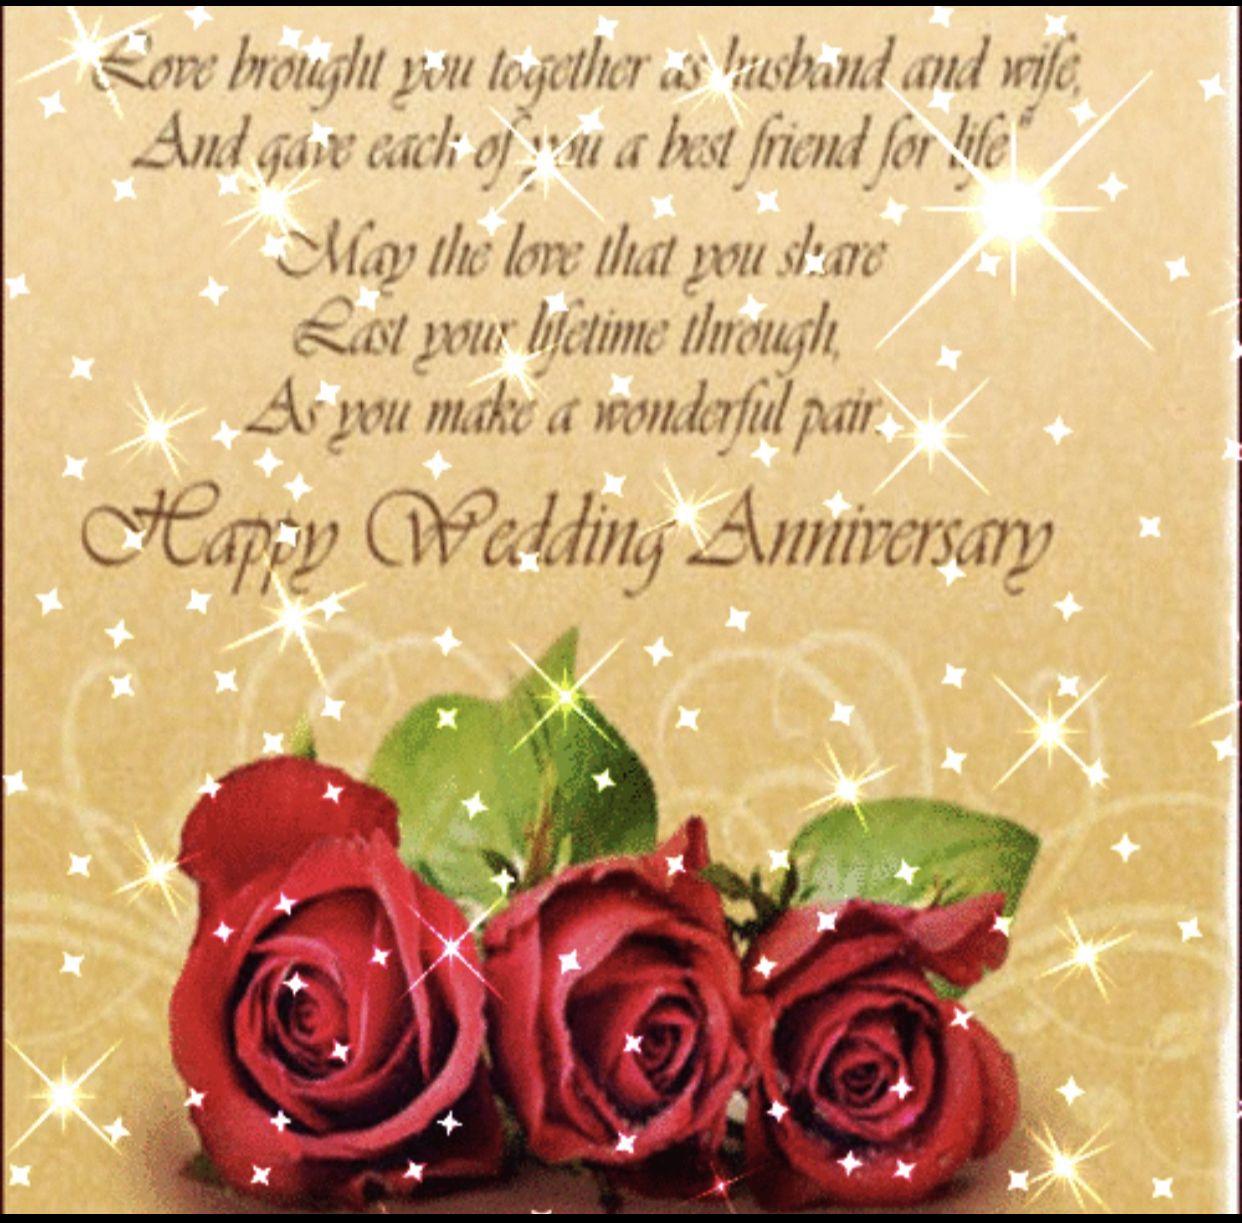 Pin By Doris Owen On Happy Annivversary Anniversary Wishes For Friends Happy Anniversary Wishes Happy Wedding Anniversary Wishes